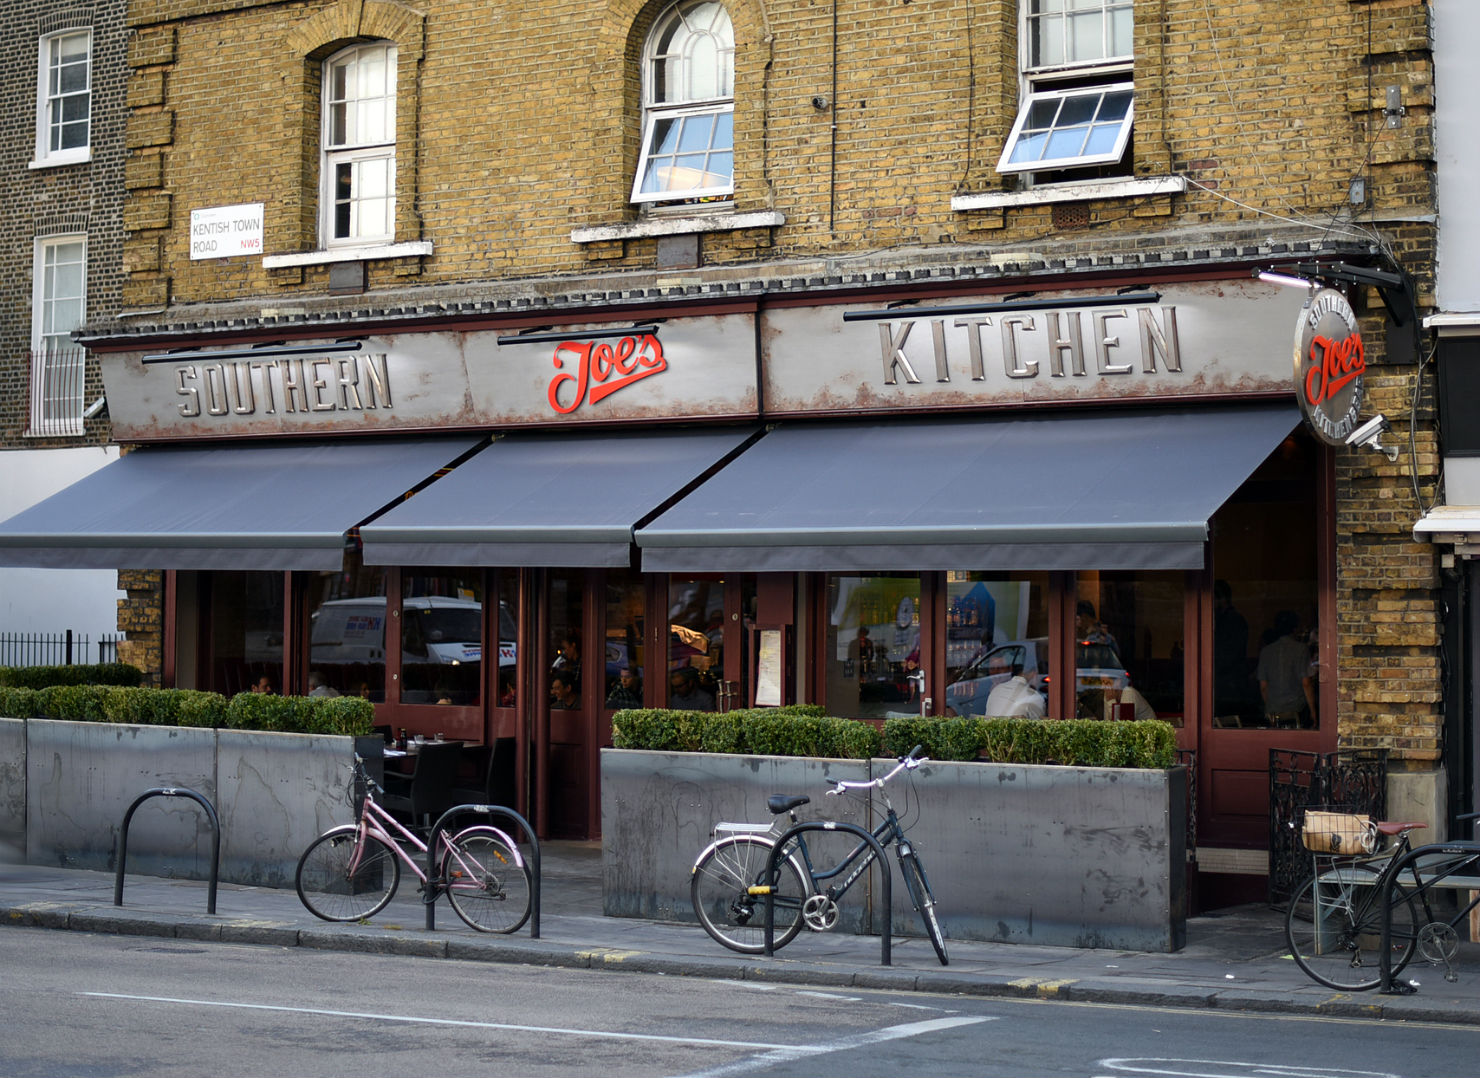 Southern Kitchen Joes Southern Kitchen Has Closed Down Kentishtowner